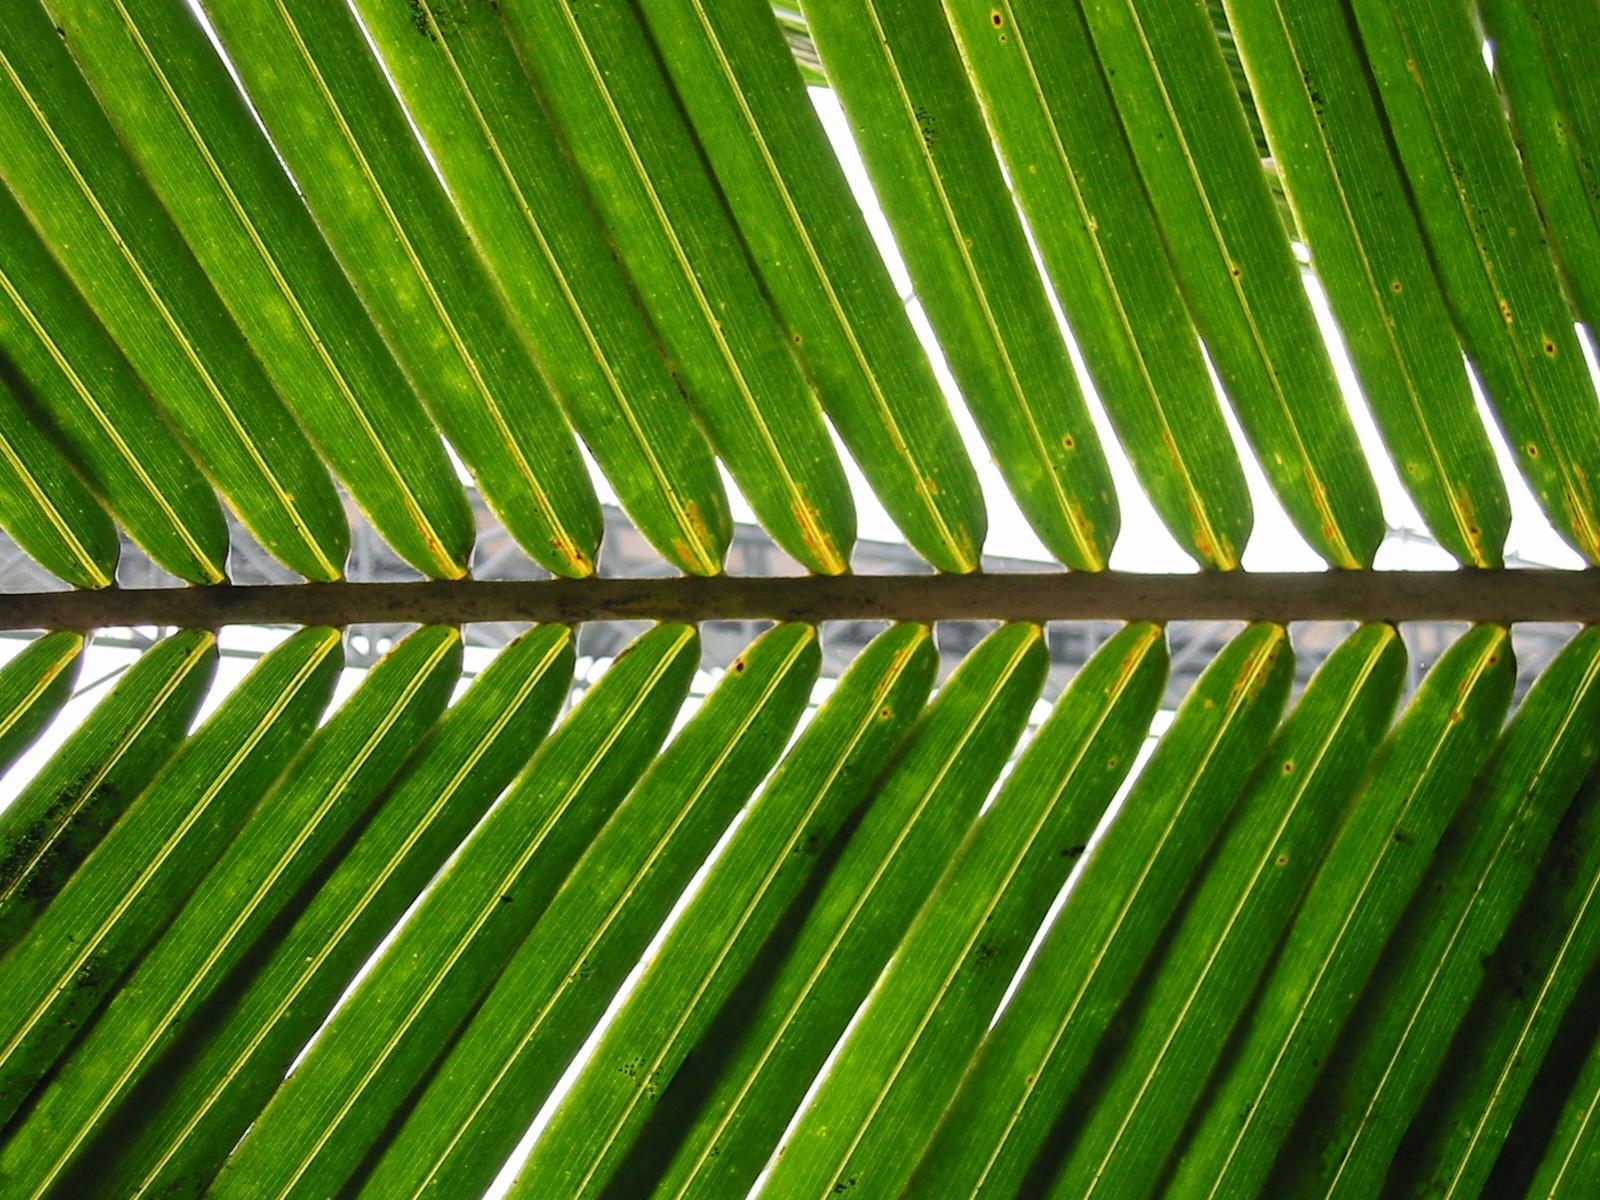 close-up of a palm branch, a metaphor for Palm Sunday, where Jesus rode into Jerusalem.